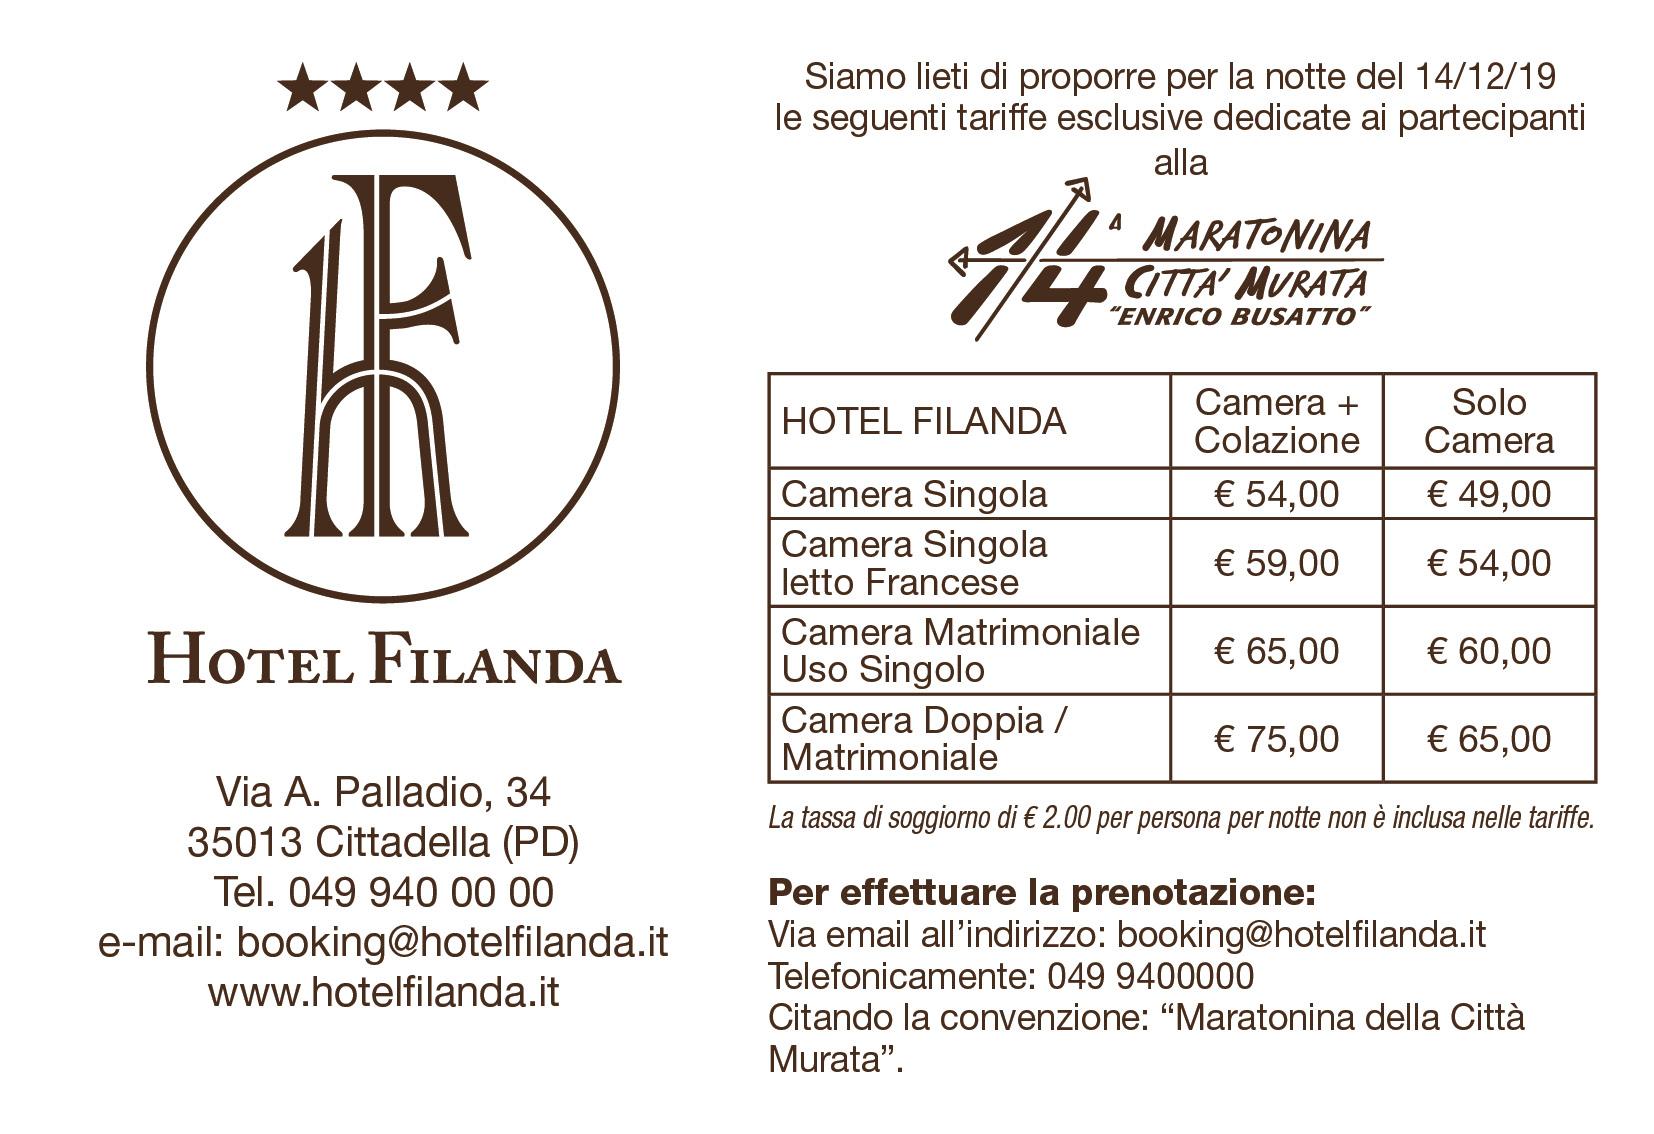 filanda-hotel-pubblicita_2